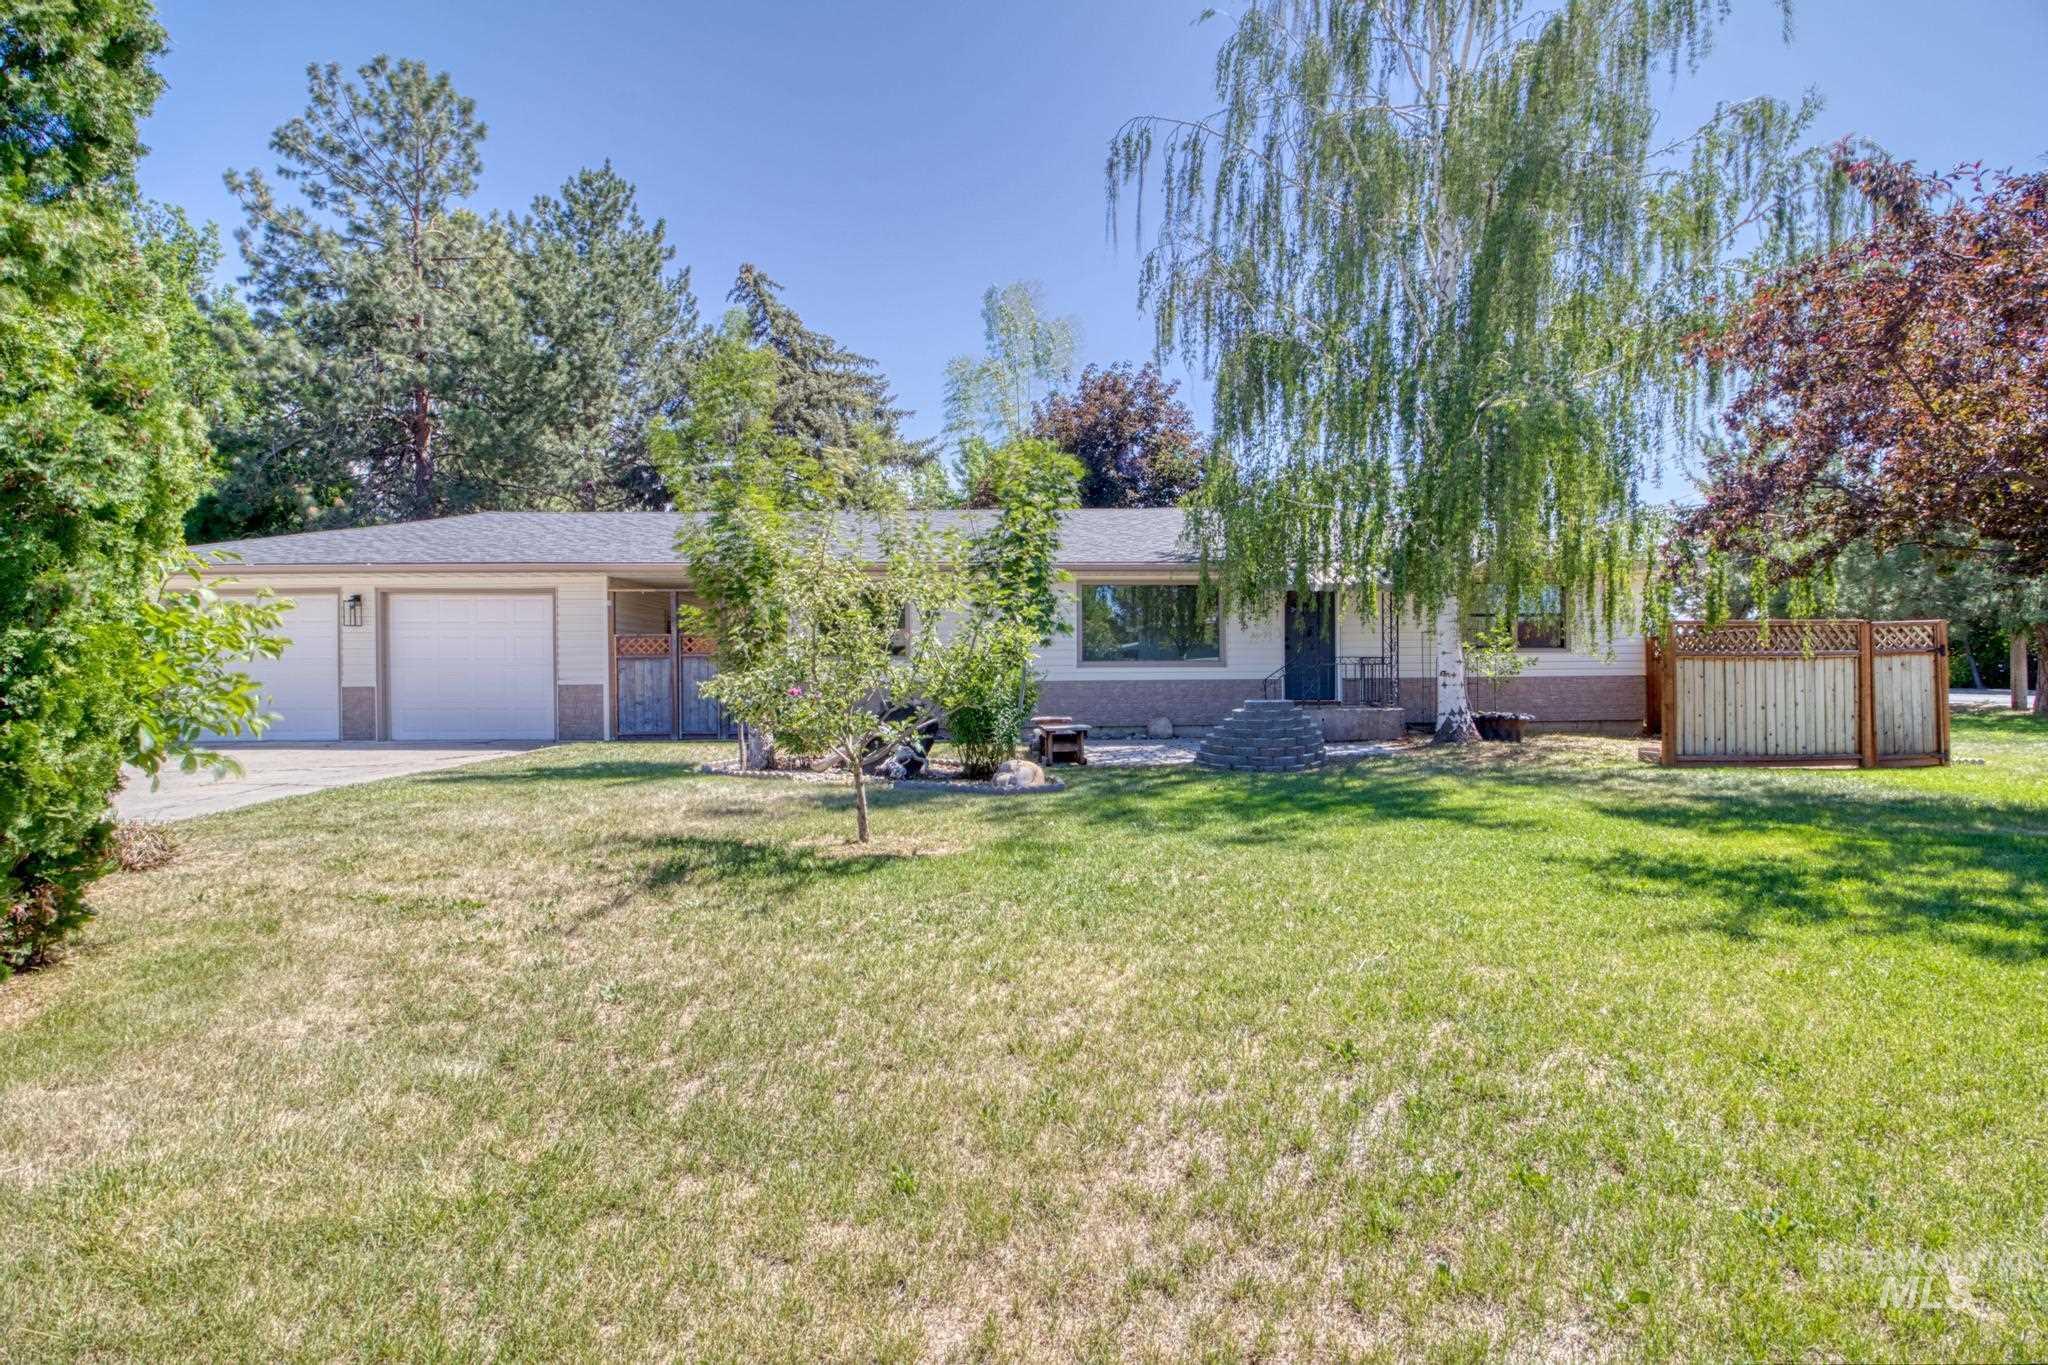 705 16th Ave E Property Photo 1